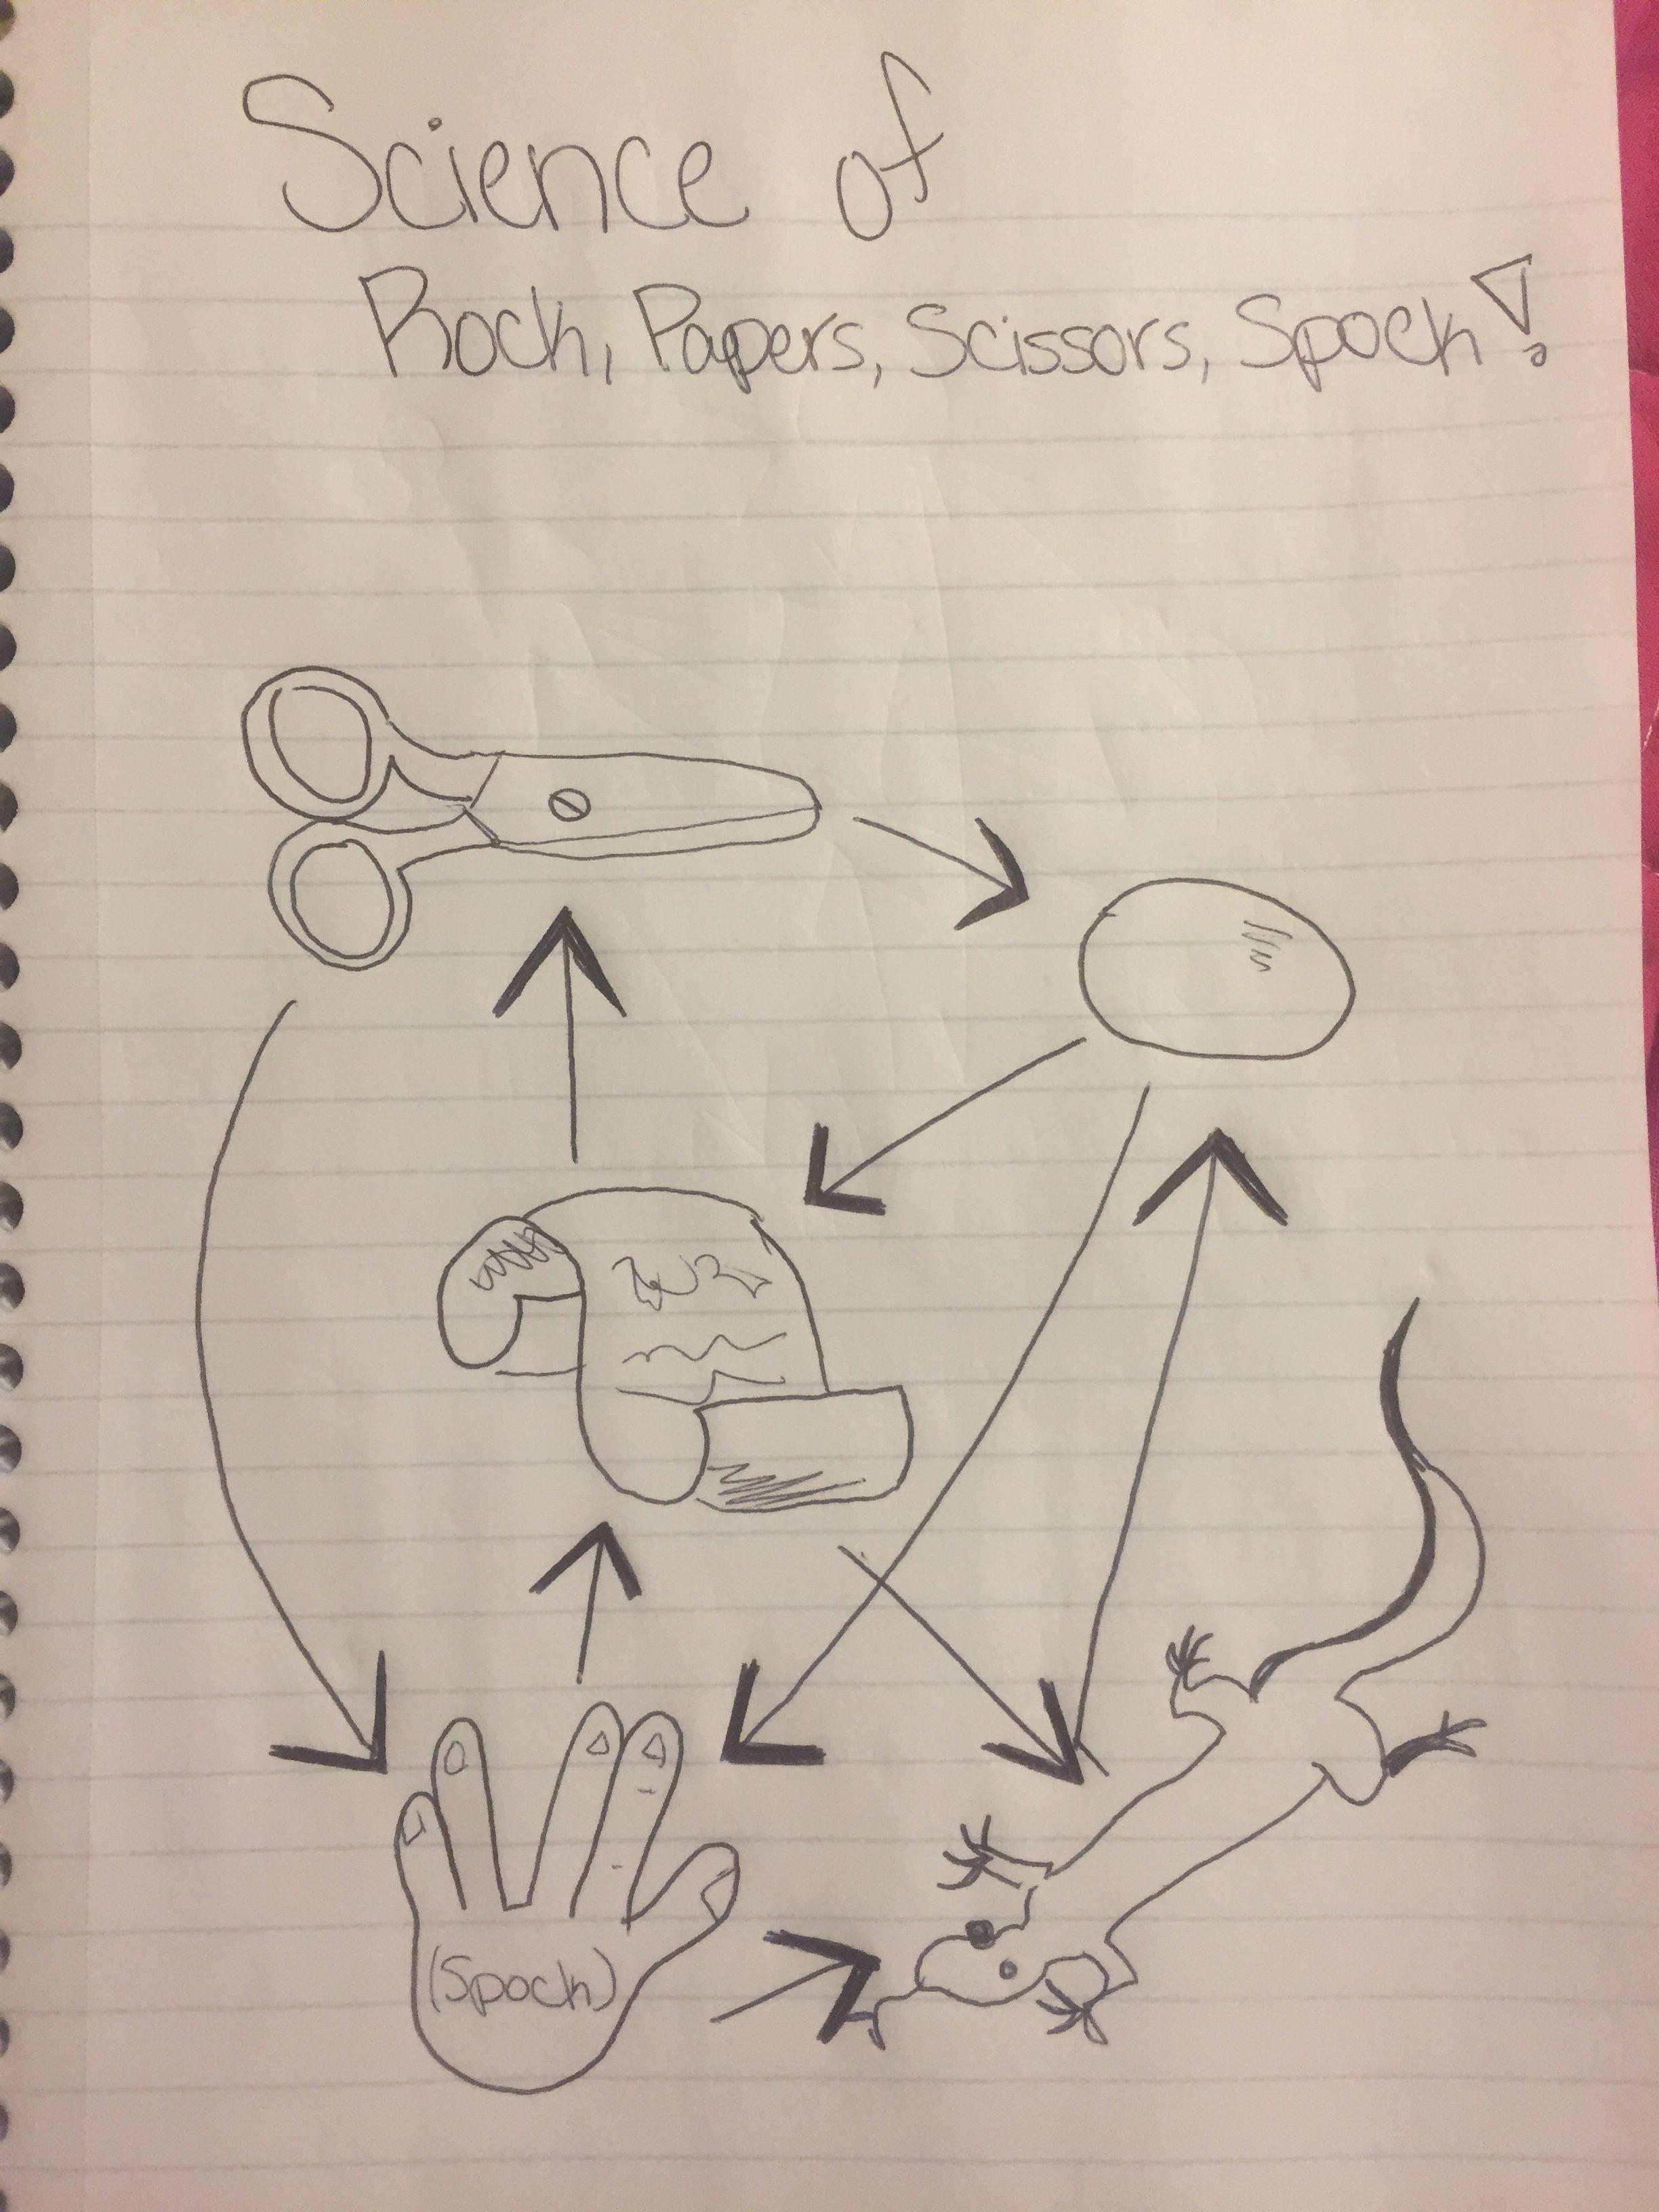 big bang theory rock paper scissors spock lizard in a science diagram  [ 2448 x 3264 Pixel ]